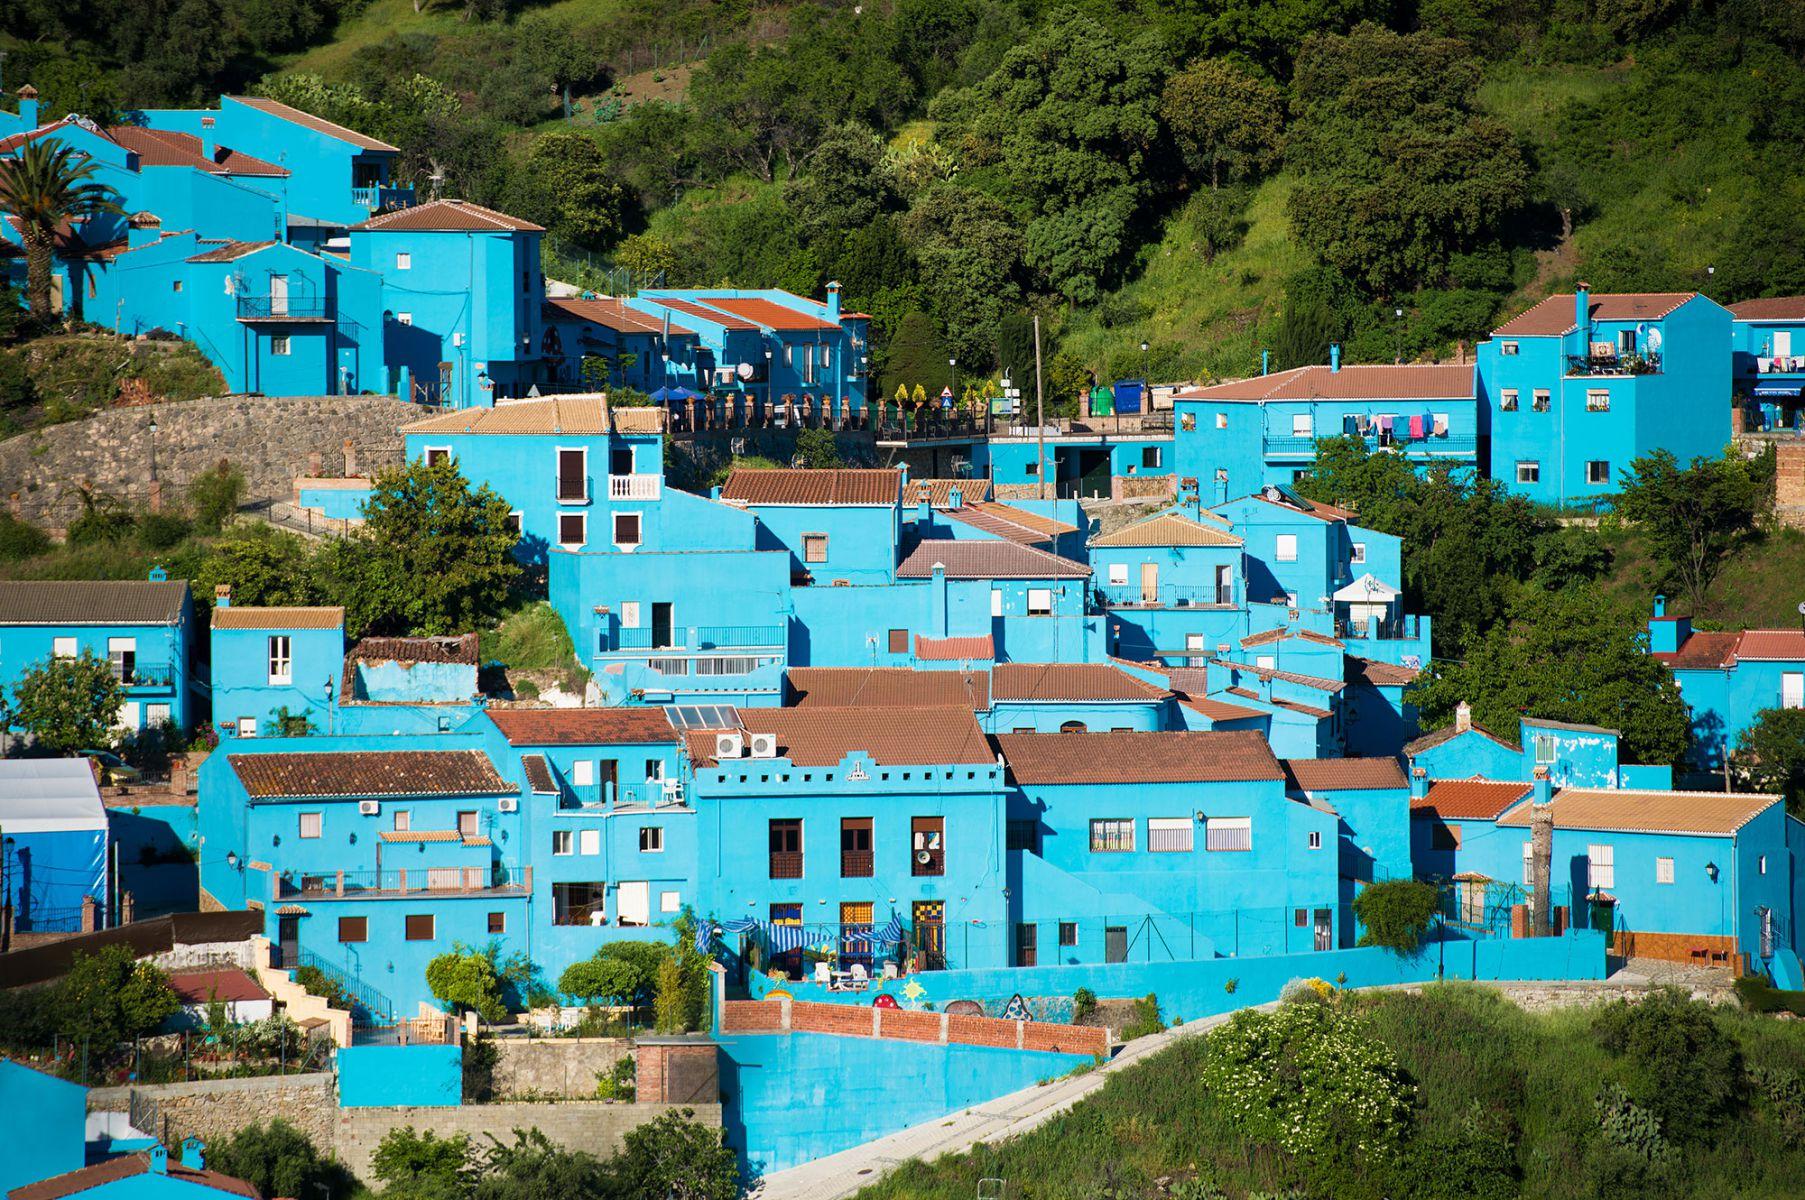 Júzcar, een blauw smurfendorp in Andalusië, Spanje